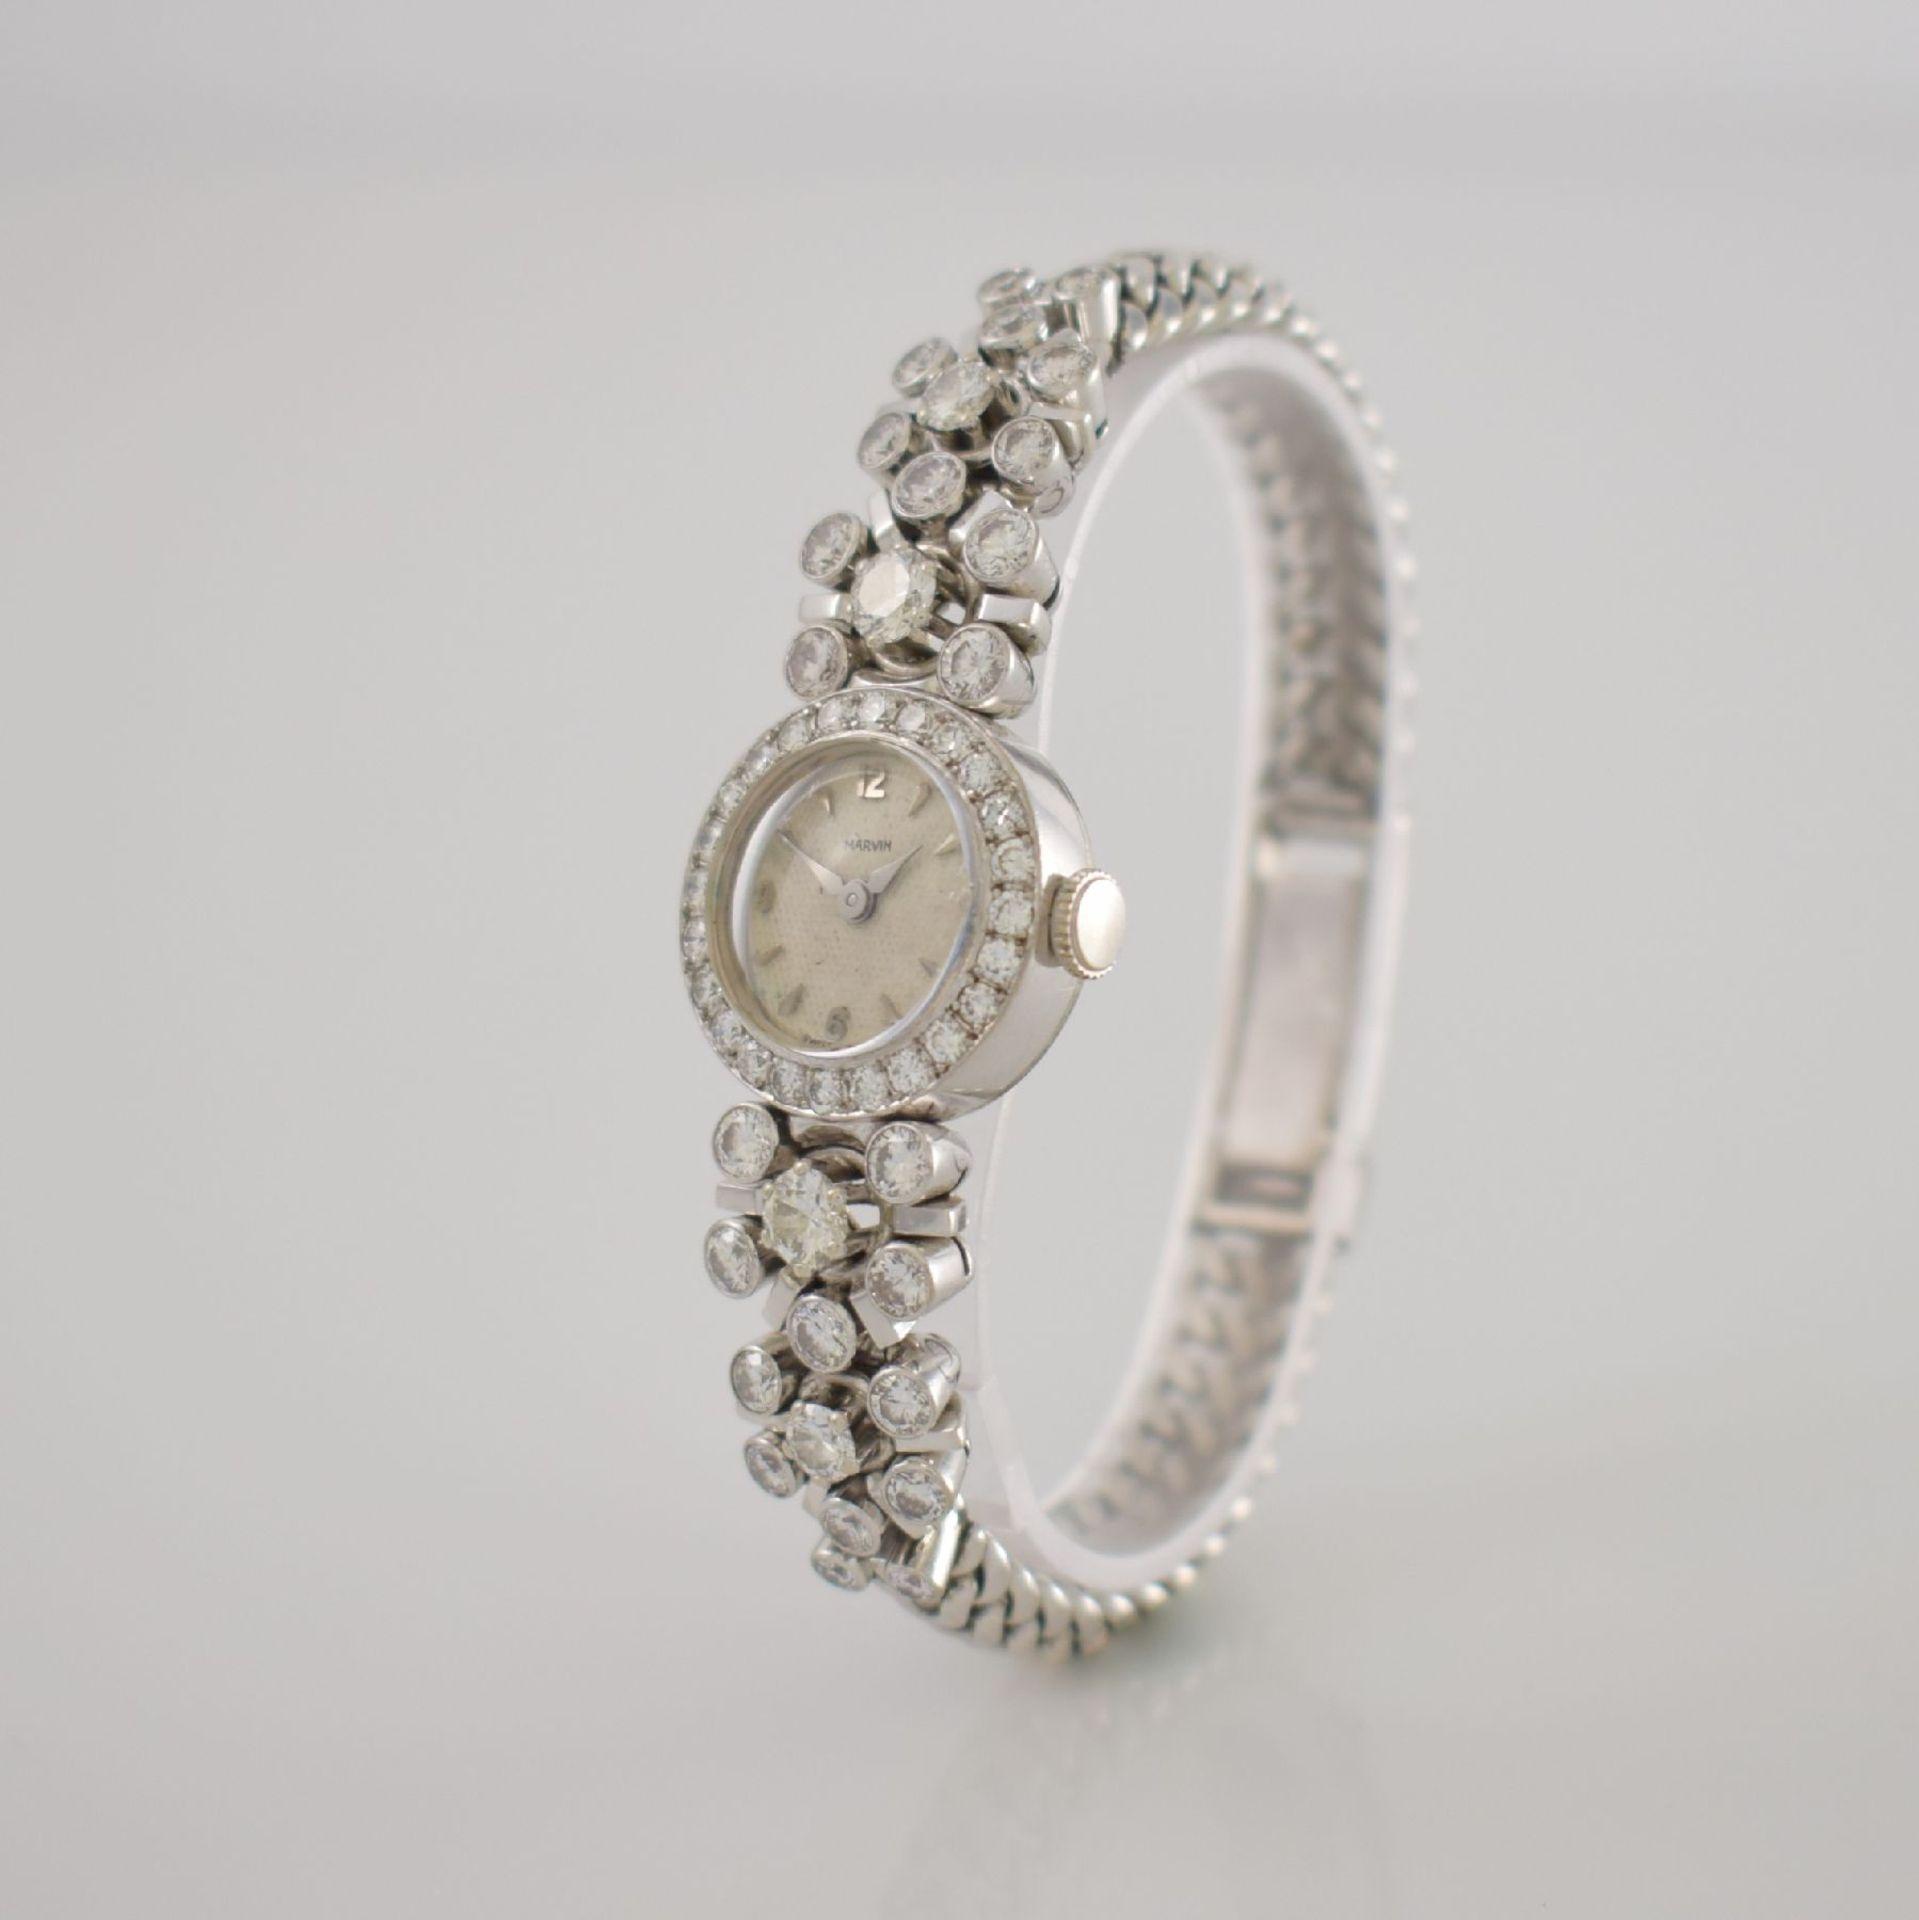 MARVIN Art Deco ausgefallene Damenarmbanduhr in WG 585/000 m. Diamanten zus. ca. 2,50 ct, Schweiz um - Bild 3 aus 5